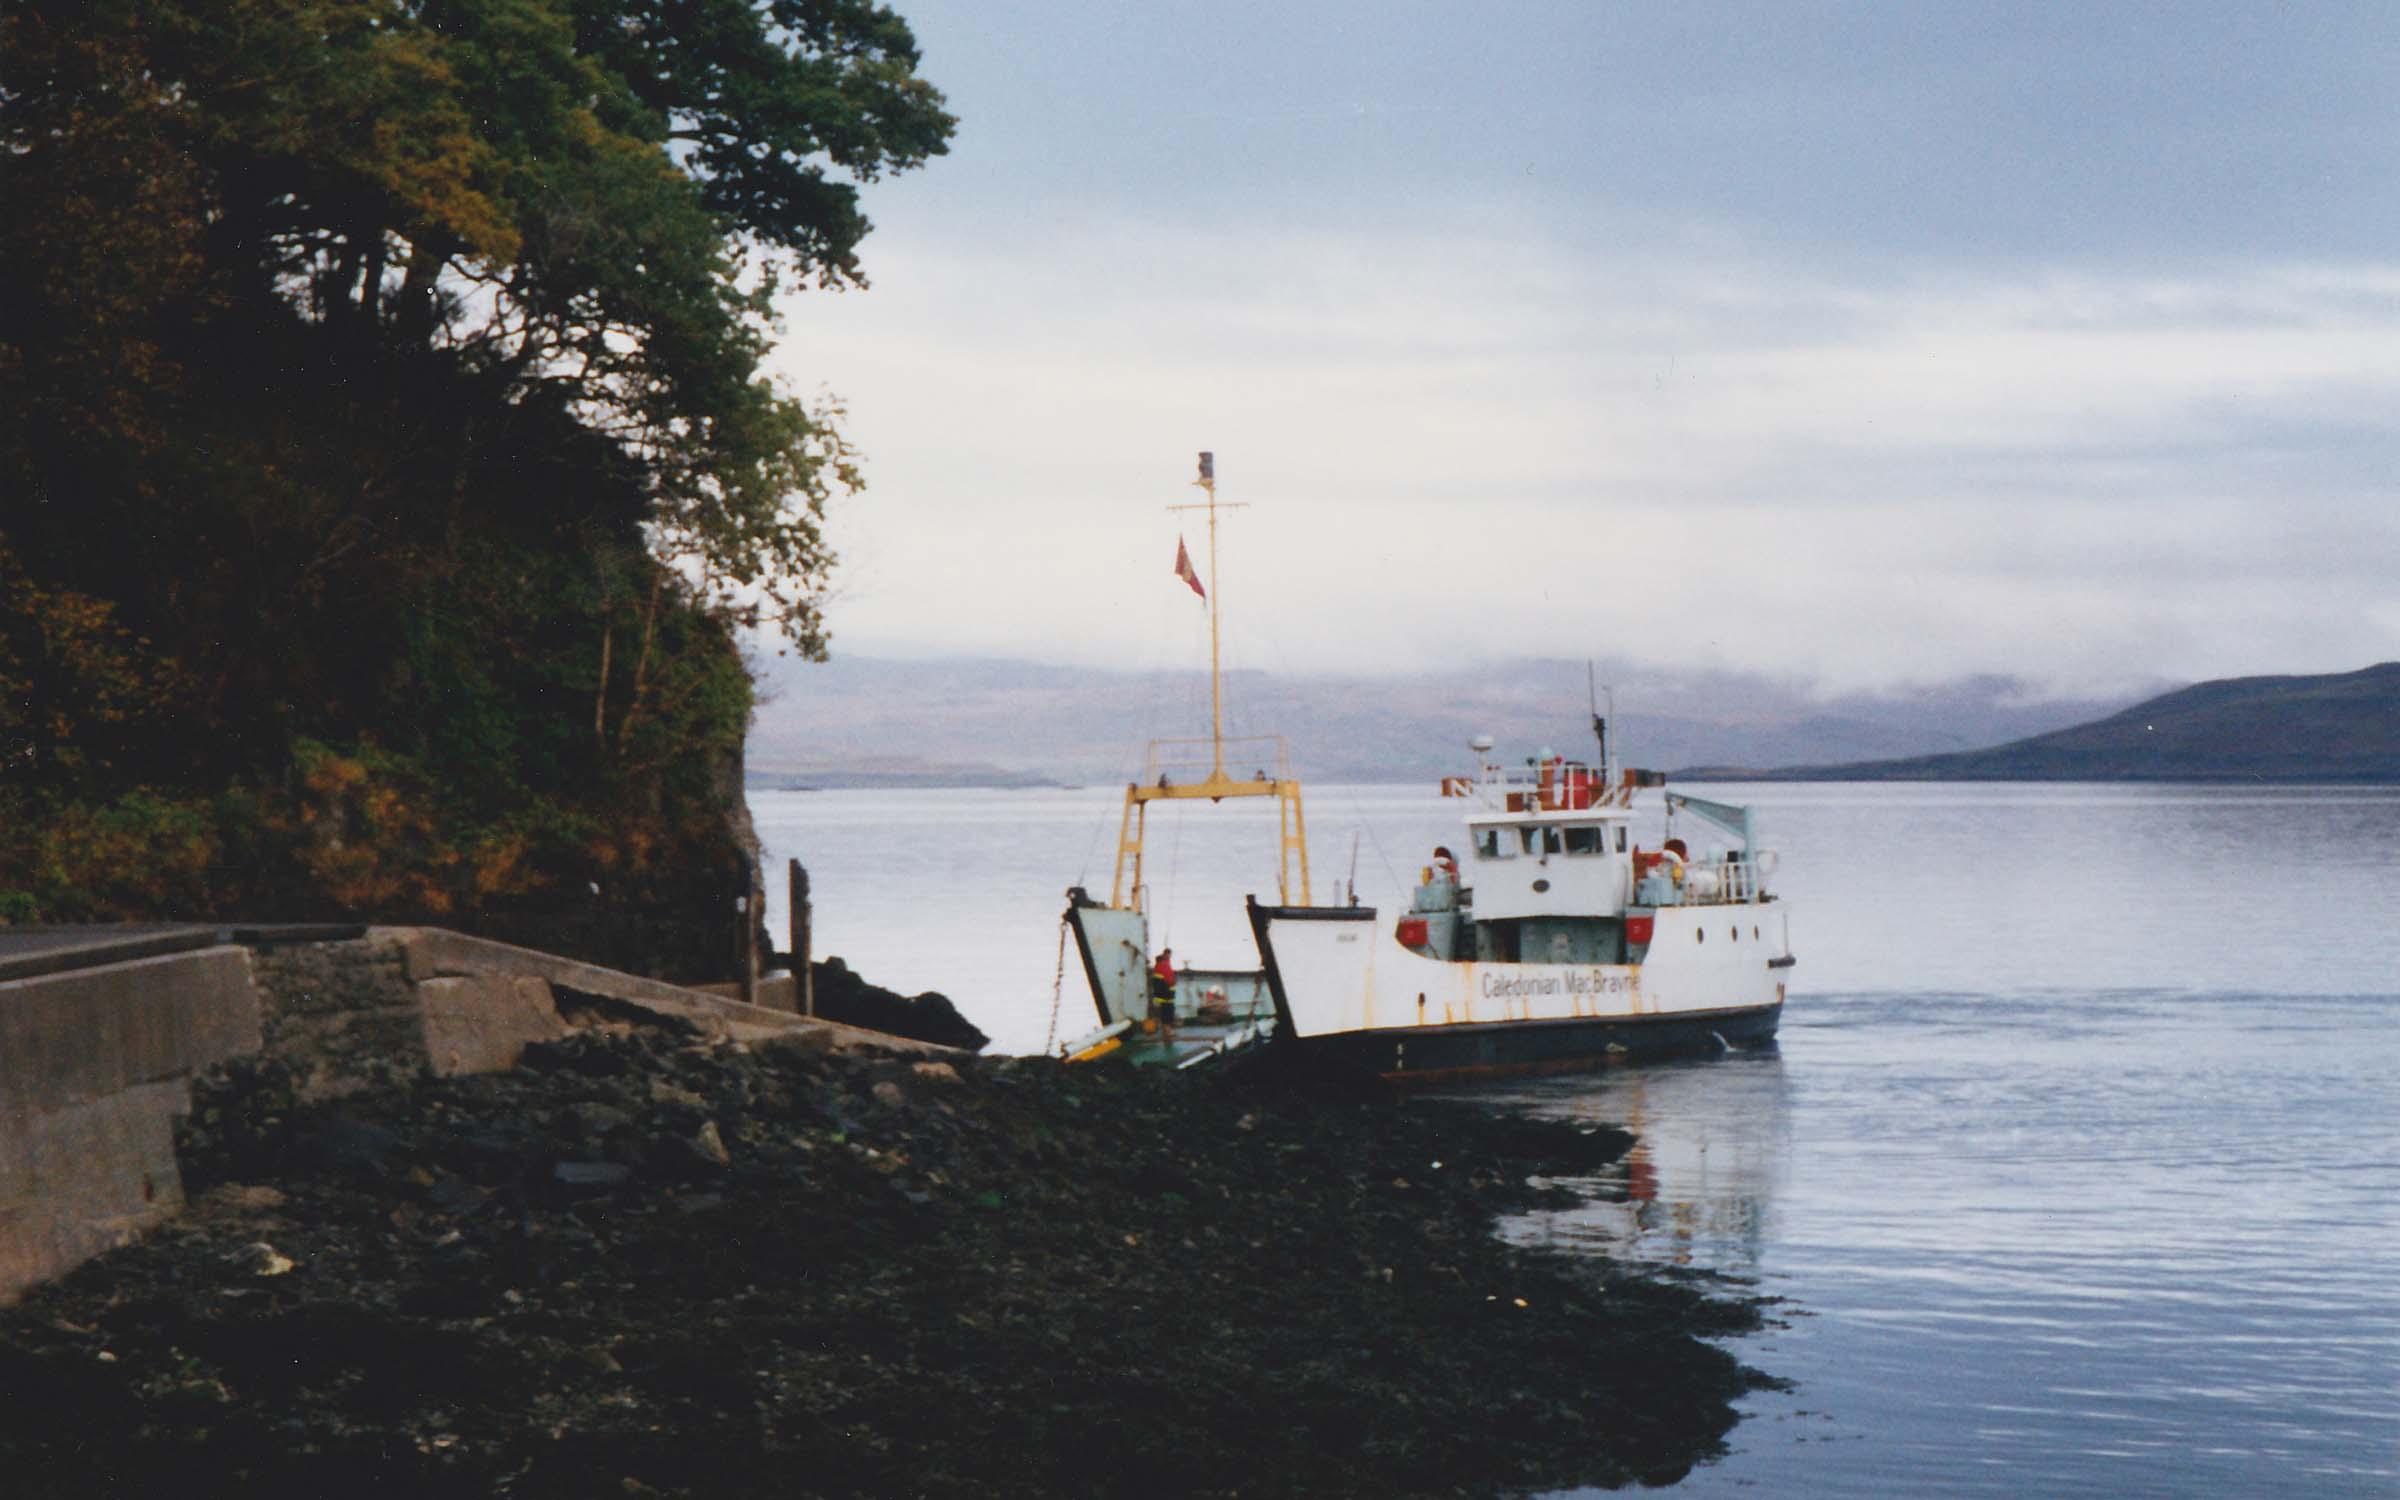 Rhum at Tobermory (Ships of CalMac)